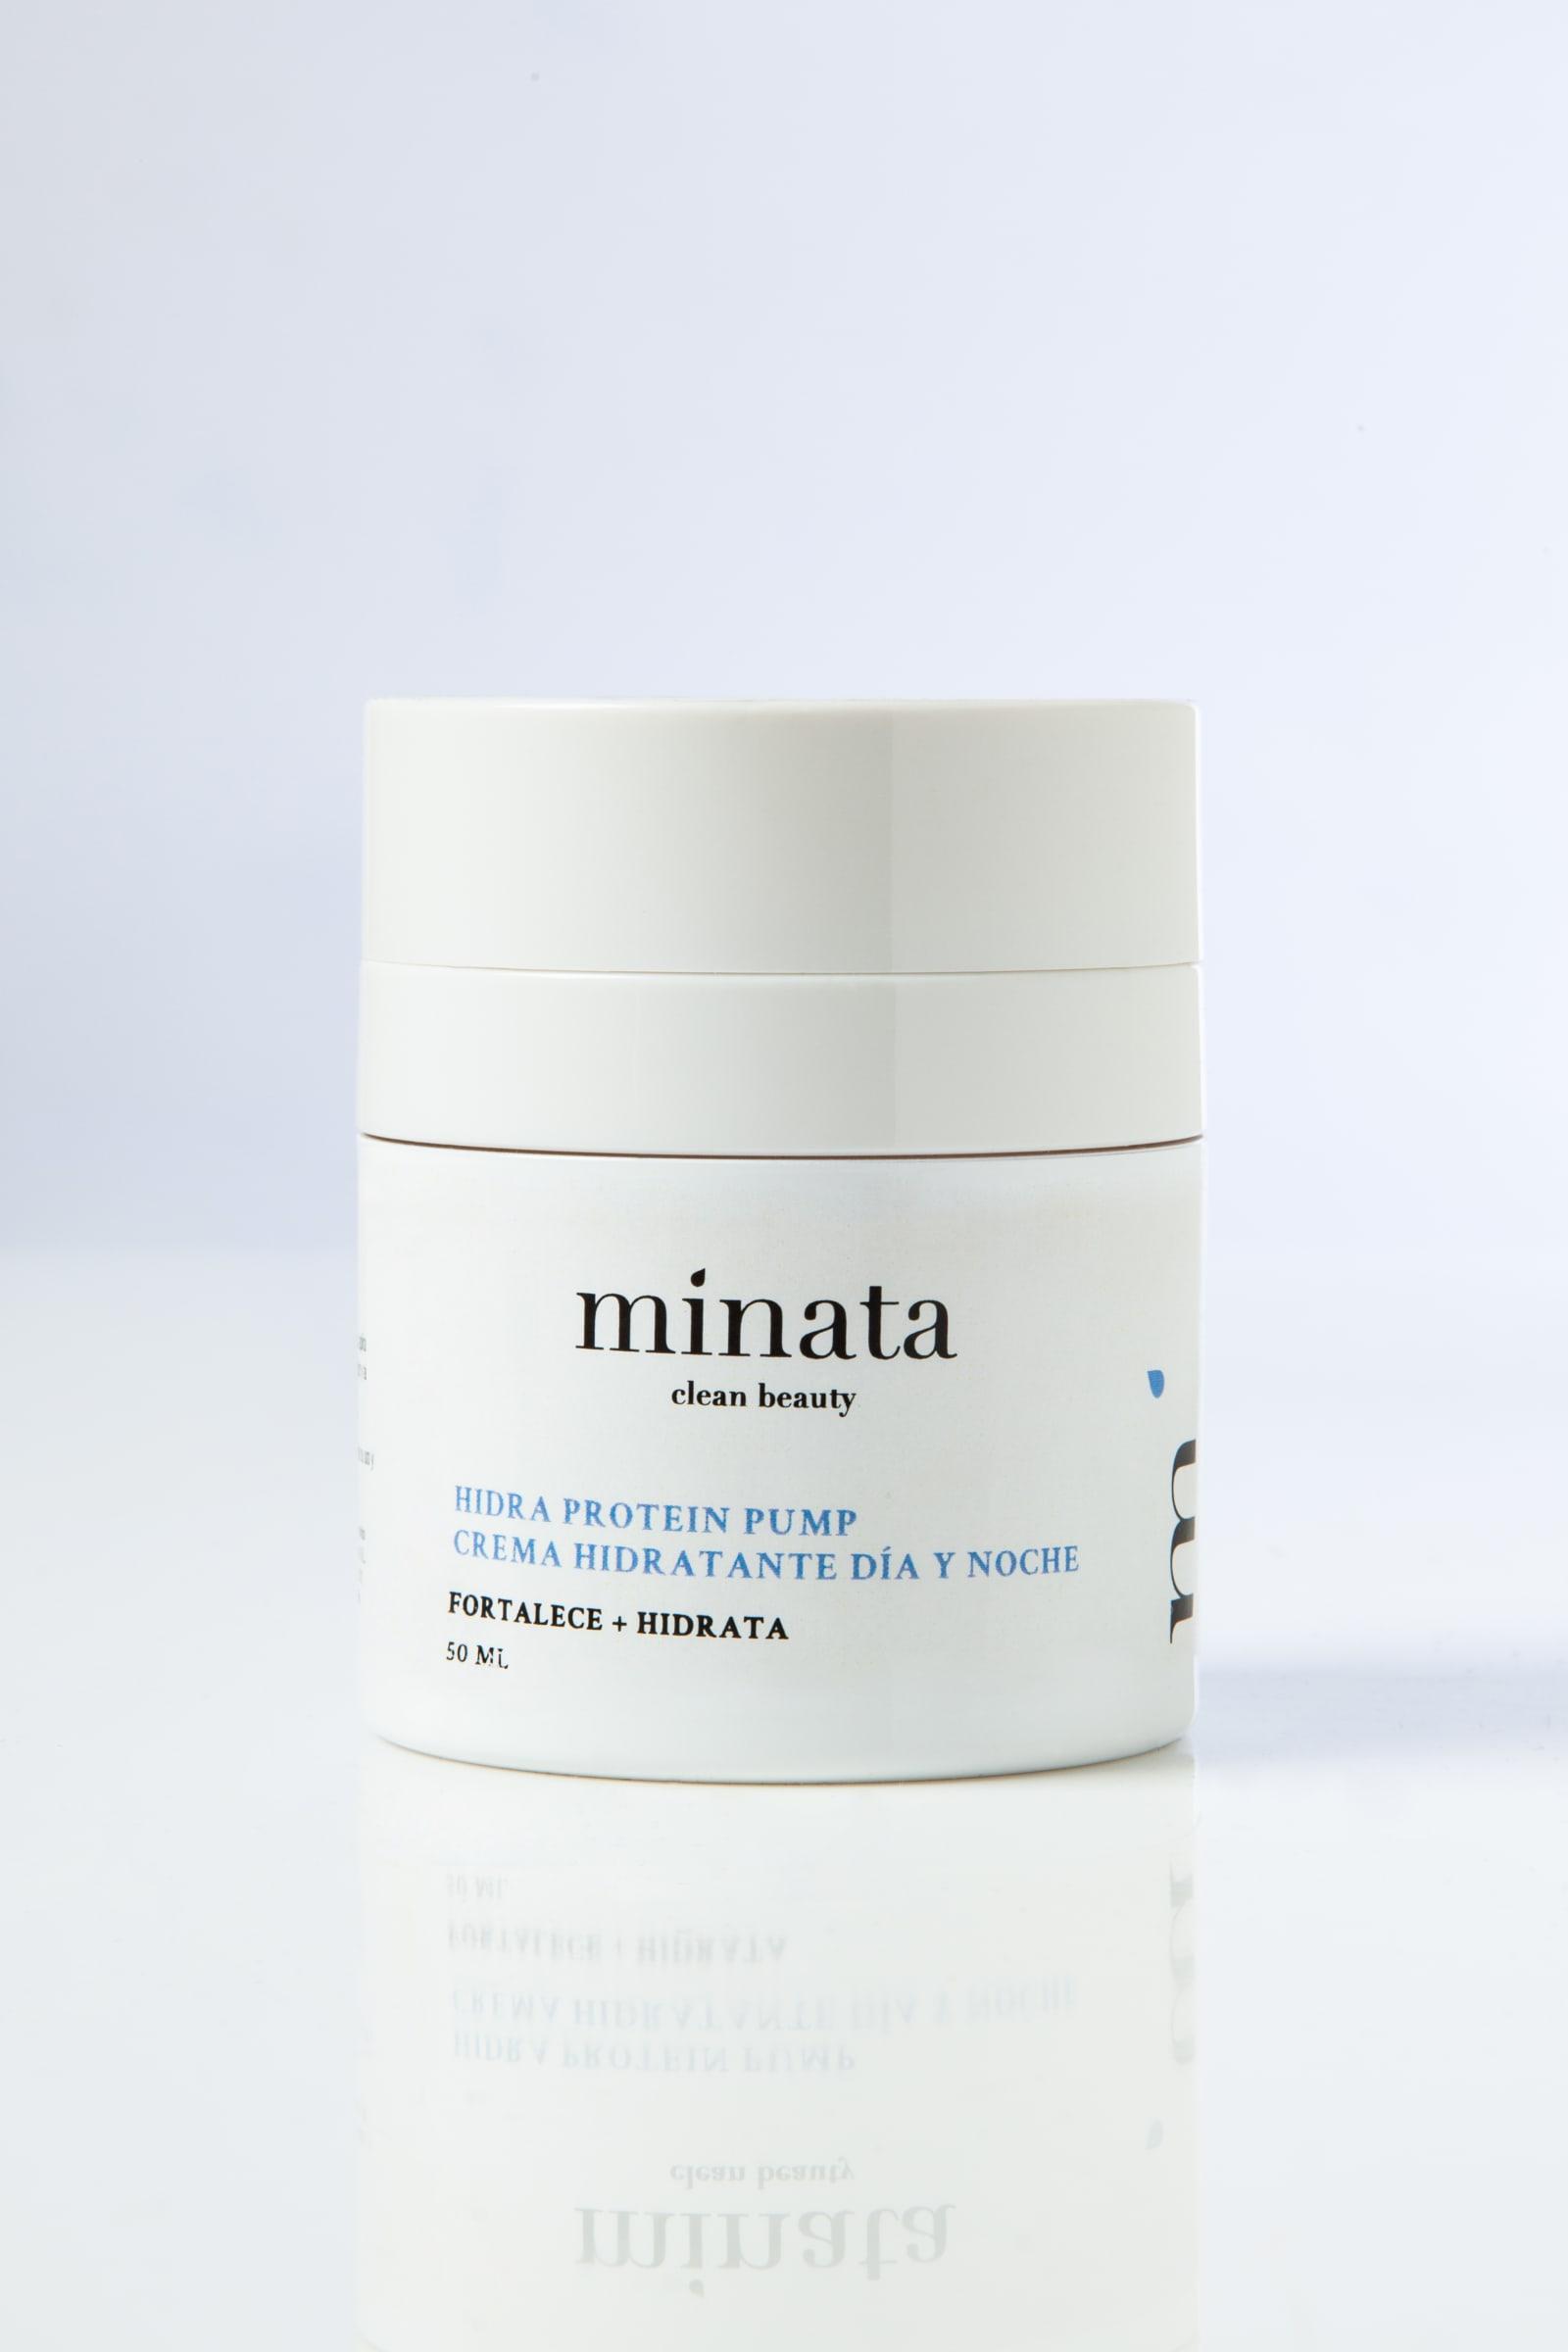 HIDRA PROTEIN PUMP 50 ML - MINATA